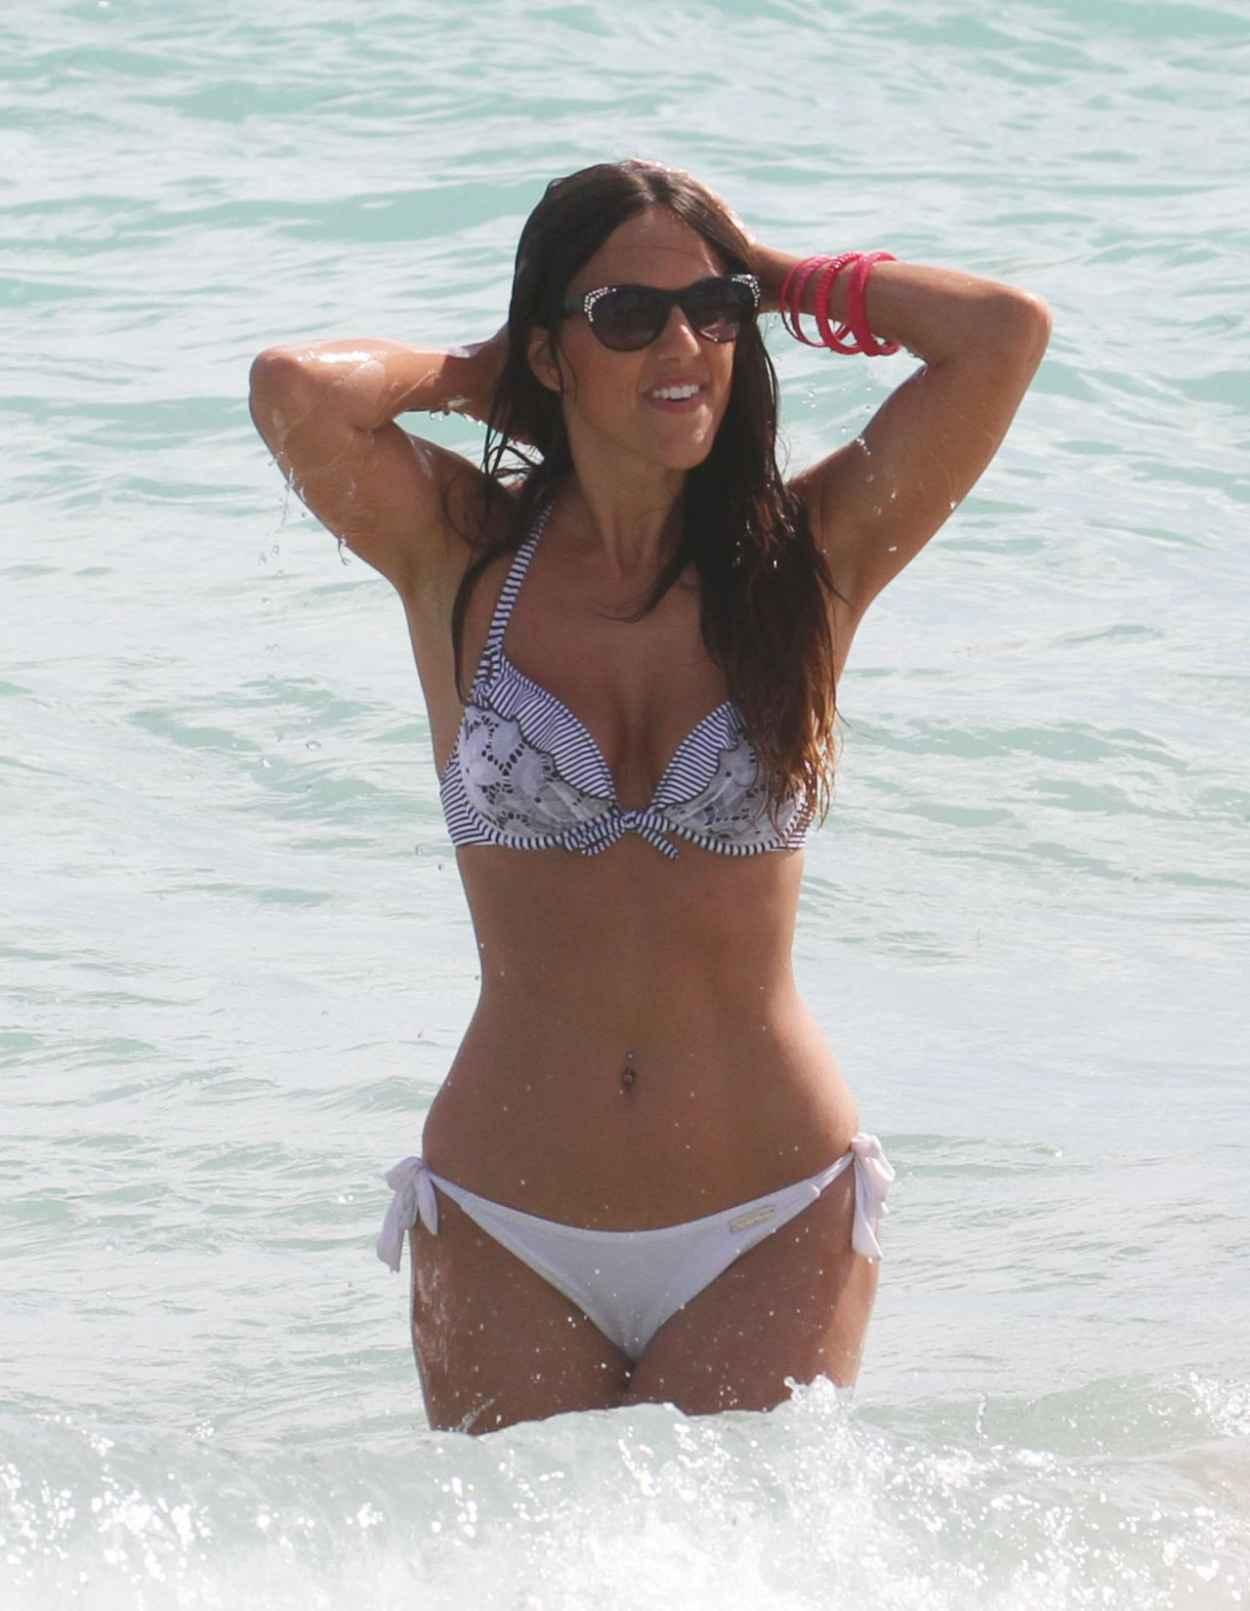 Claudia Romani Hot in Bikini - Showing off her Toned Body at a Beach in Miami - February 2015-5